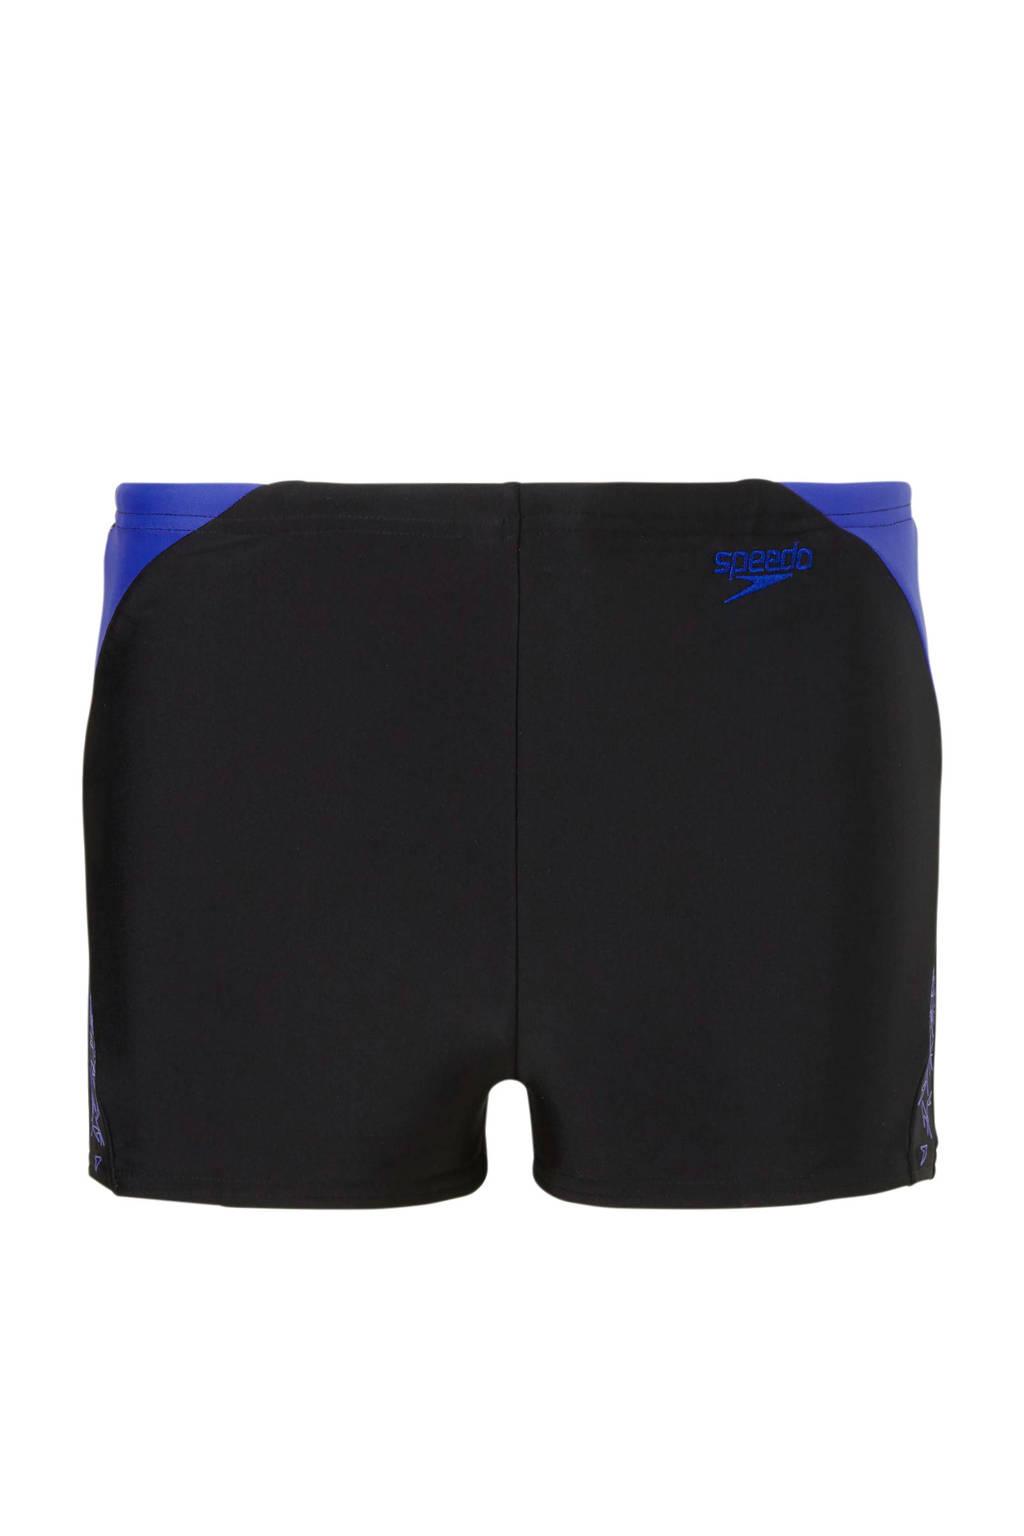 Speedo Endurance 10 zwemboxer junior zwart, Zwart/paars